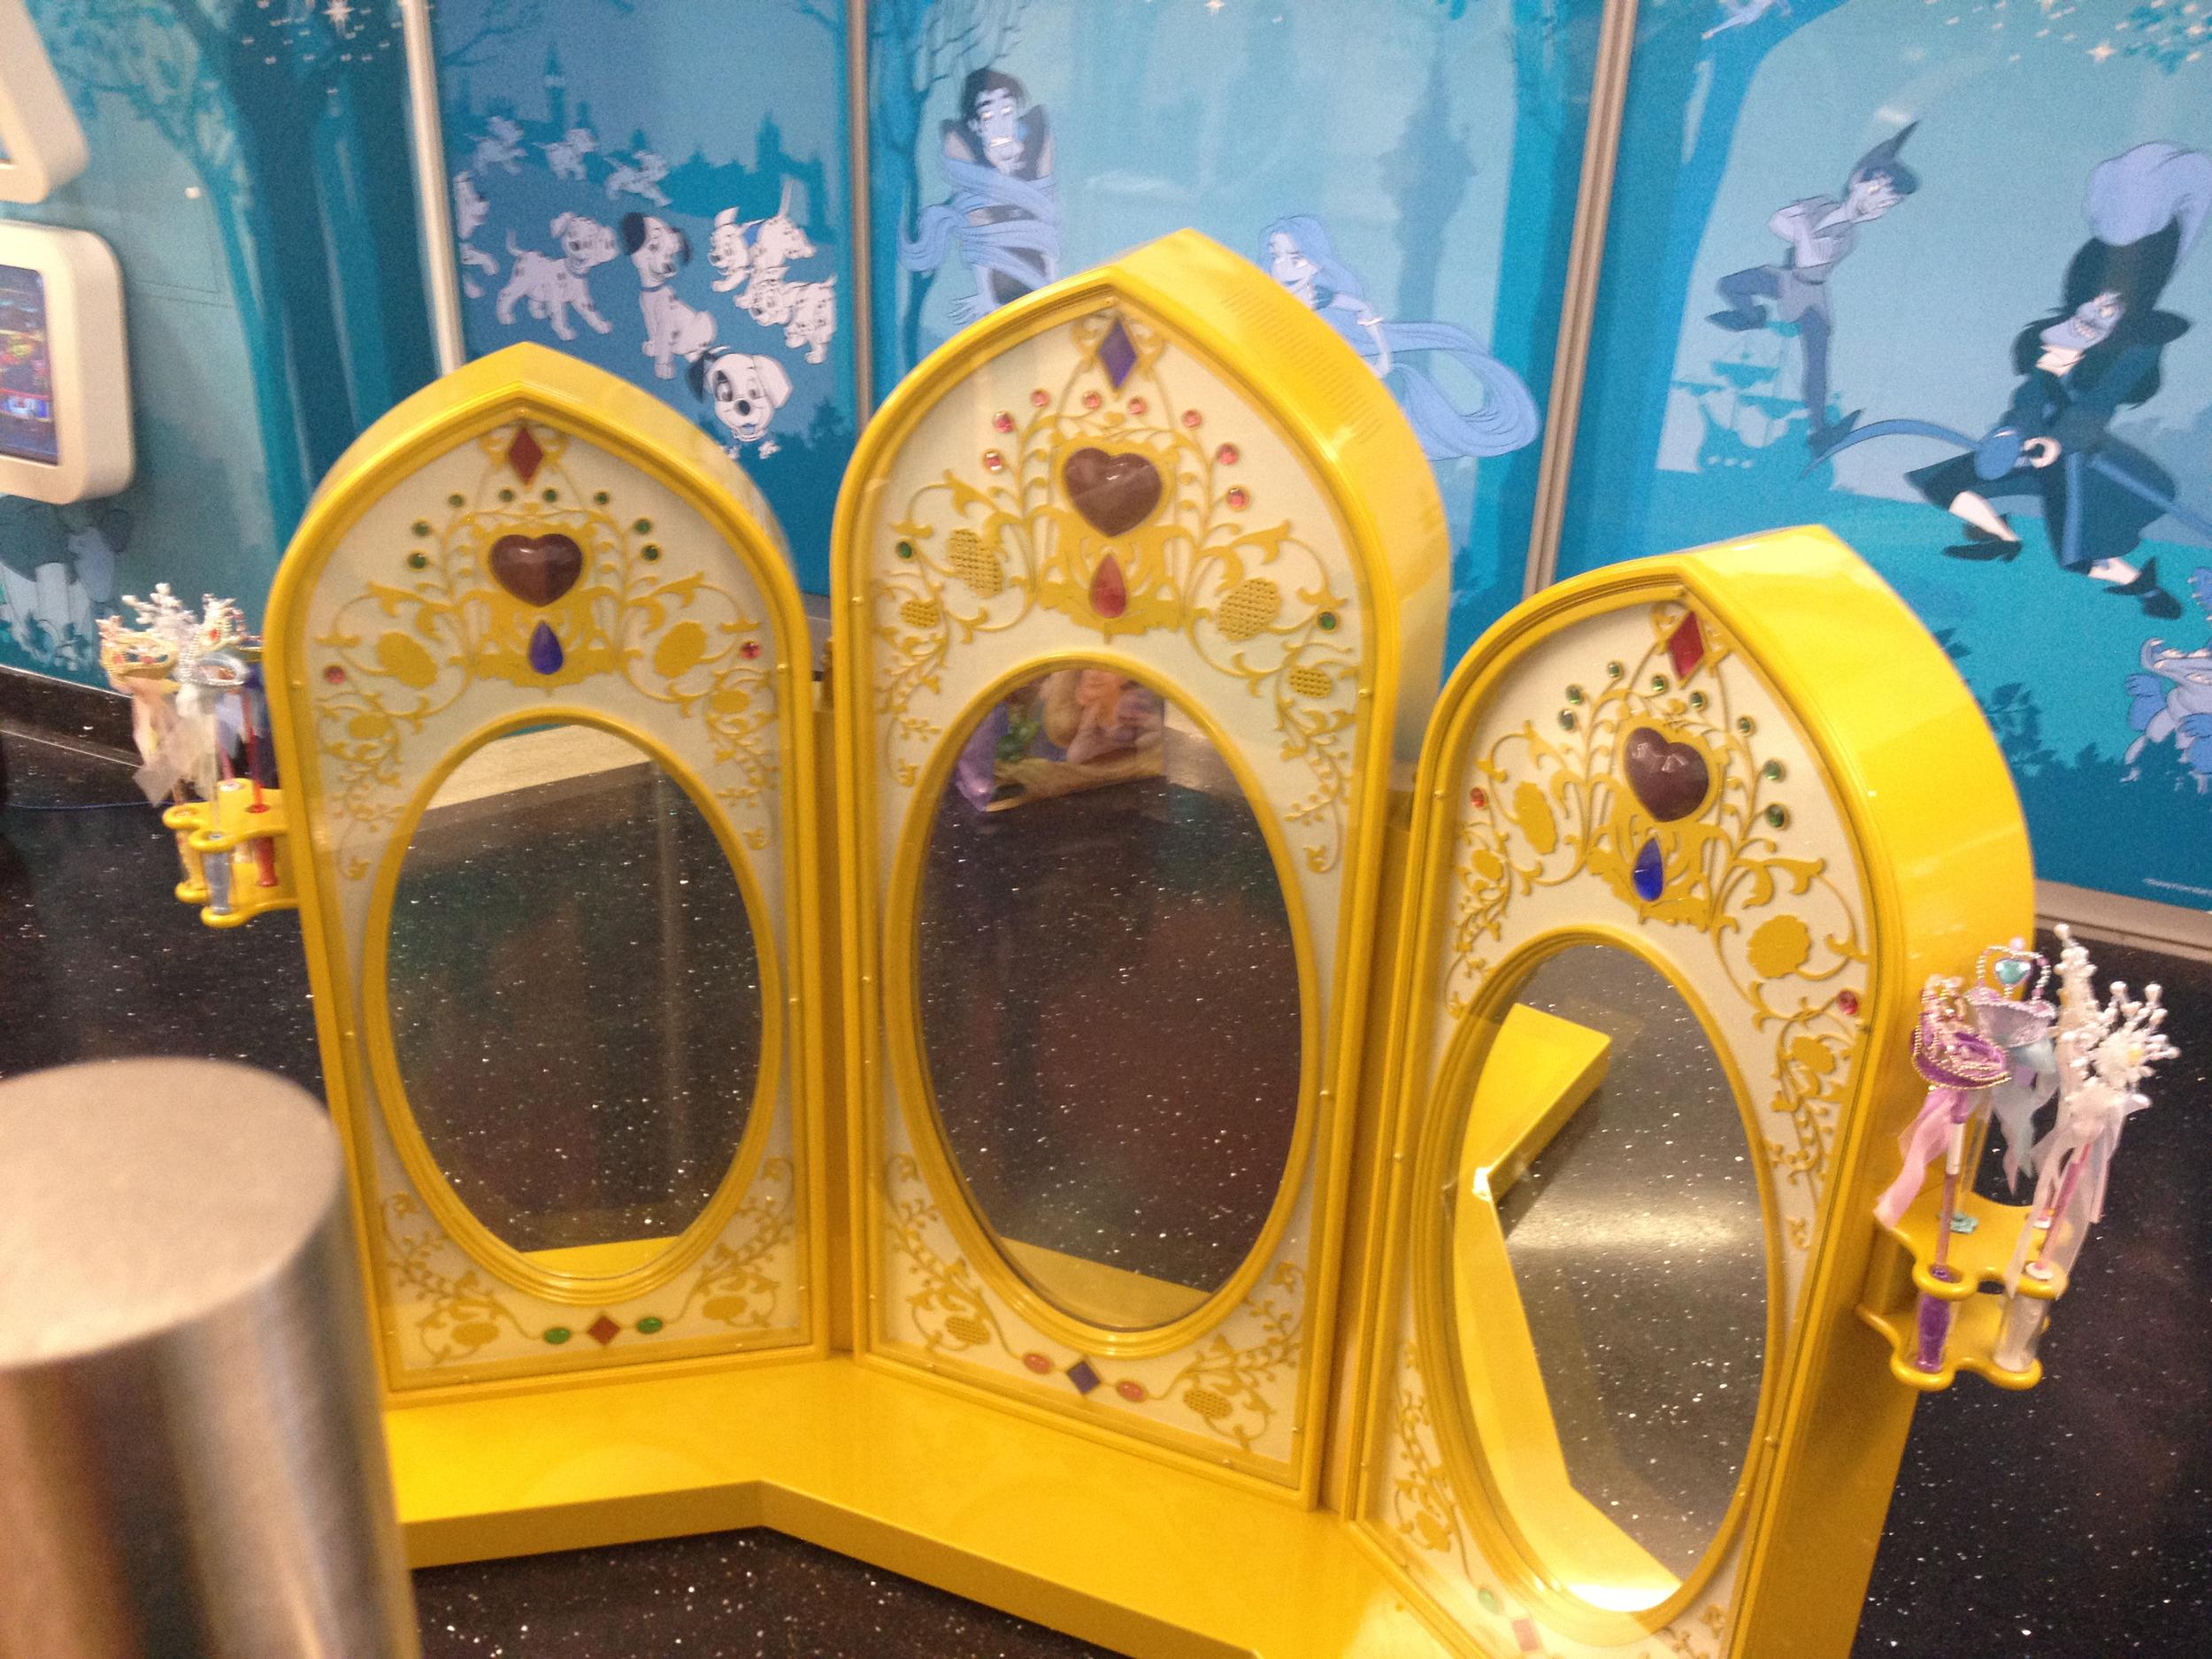 GOSH-Disney-Playhouse-Interactive-Fixture-Specialsit-Fixture